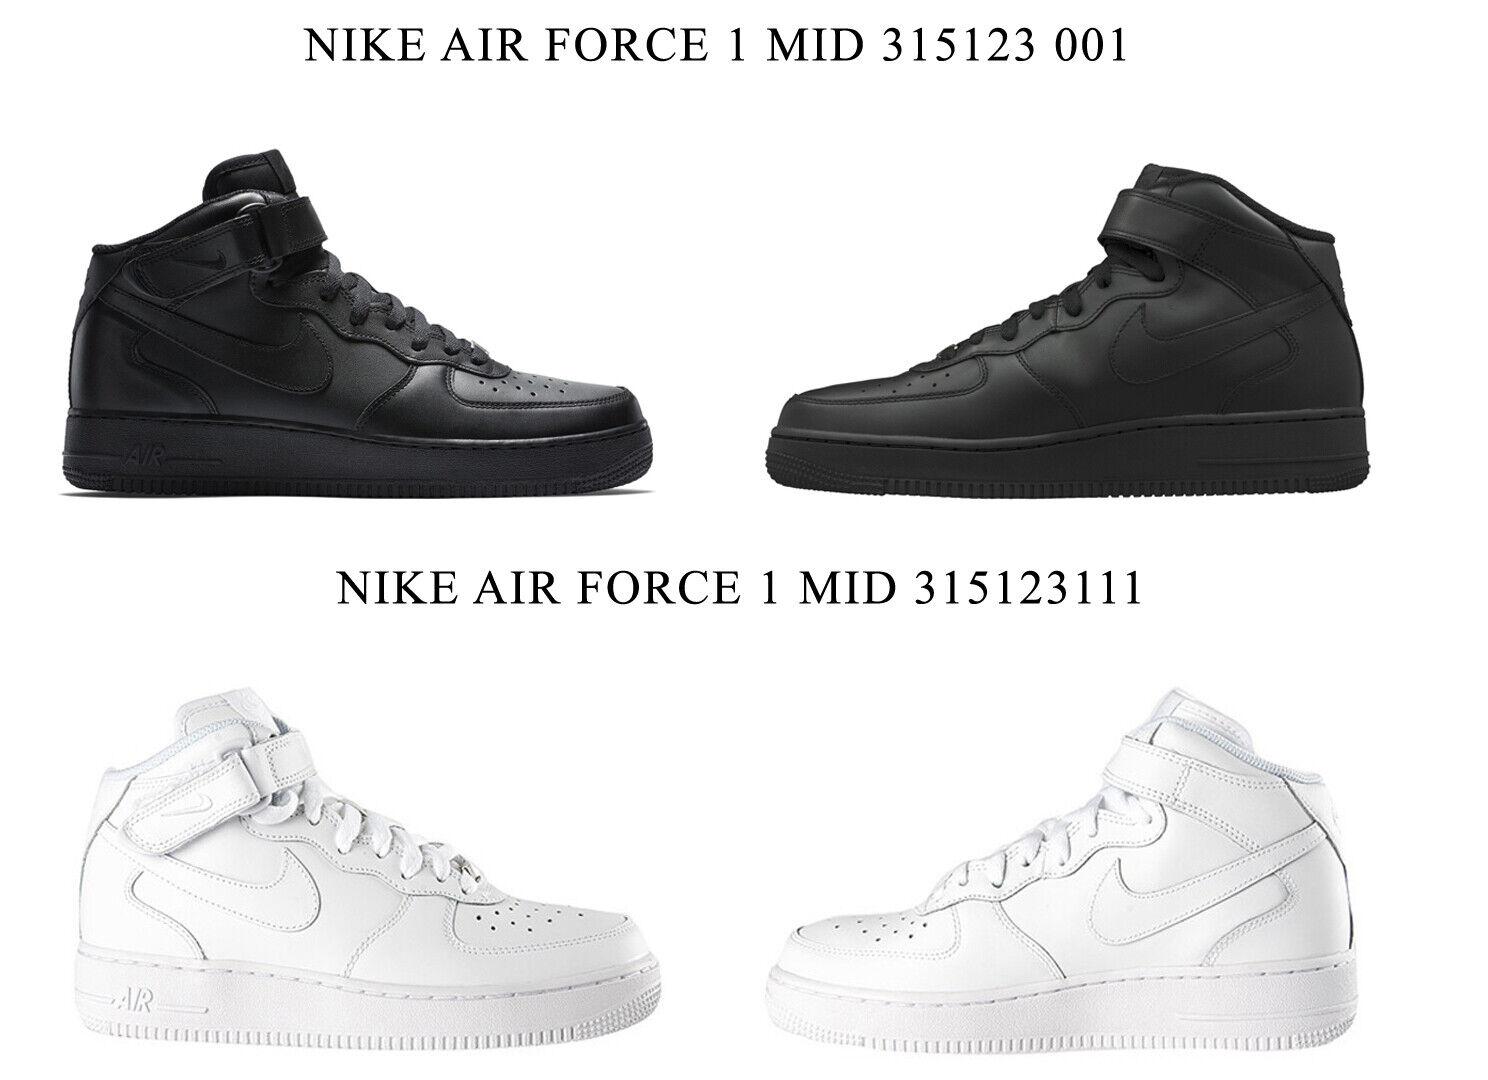 NIKE AIR FORCE 1 MID 315123 001/315123 111 HERRENSCHUHE HIGHT Gr. US 8.5 - 11